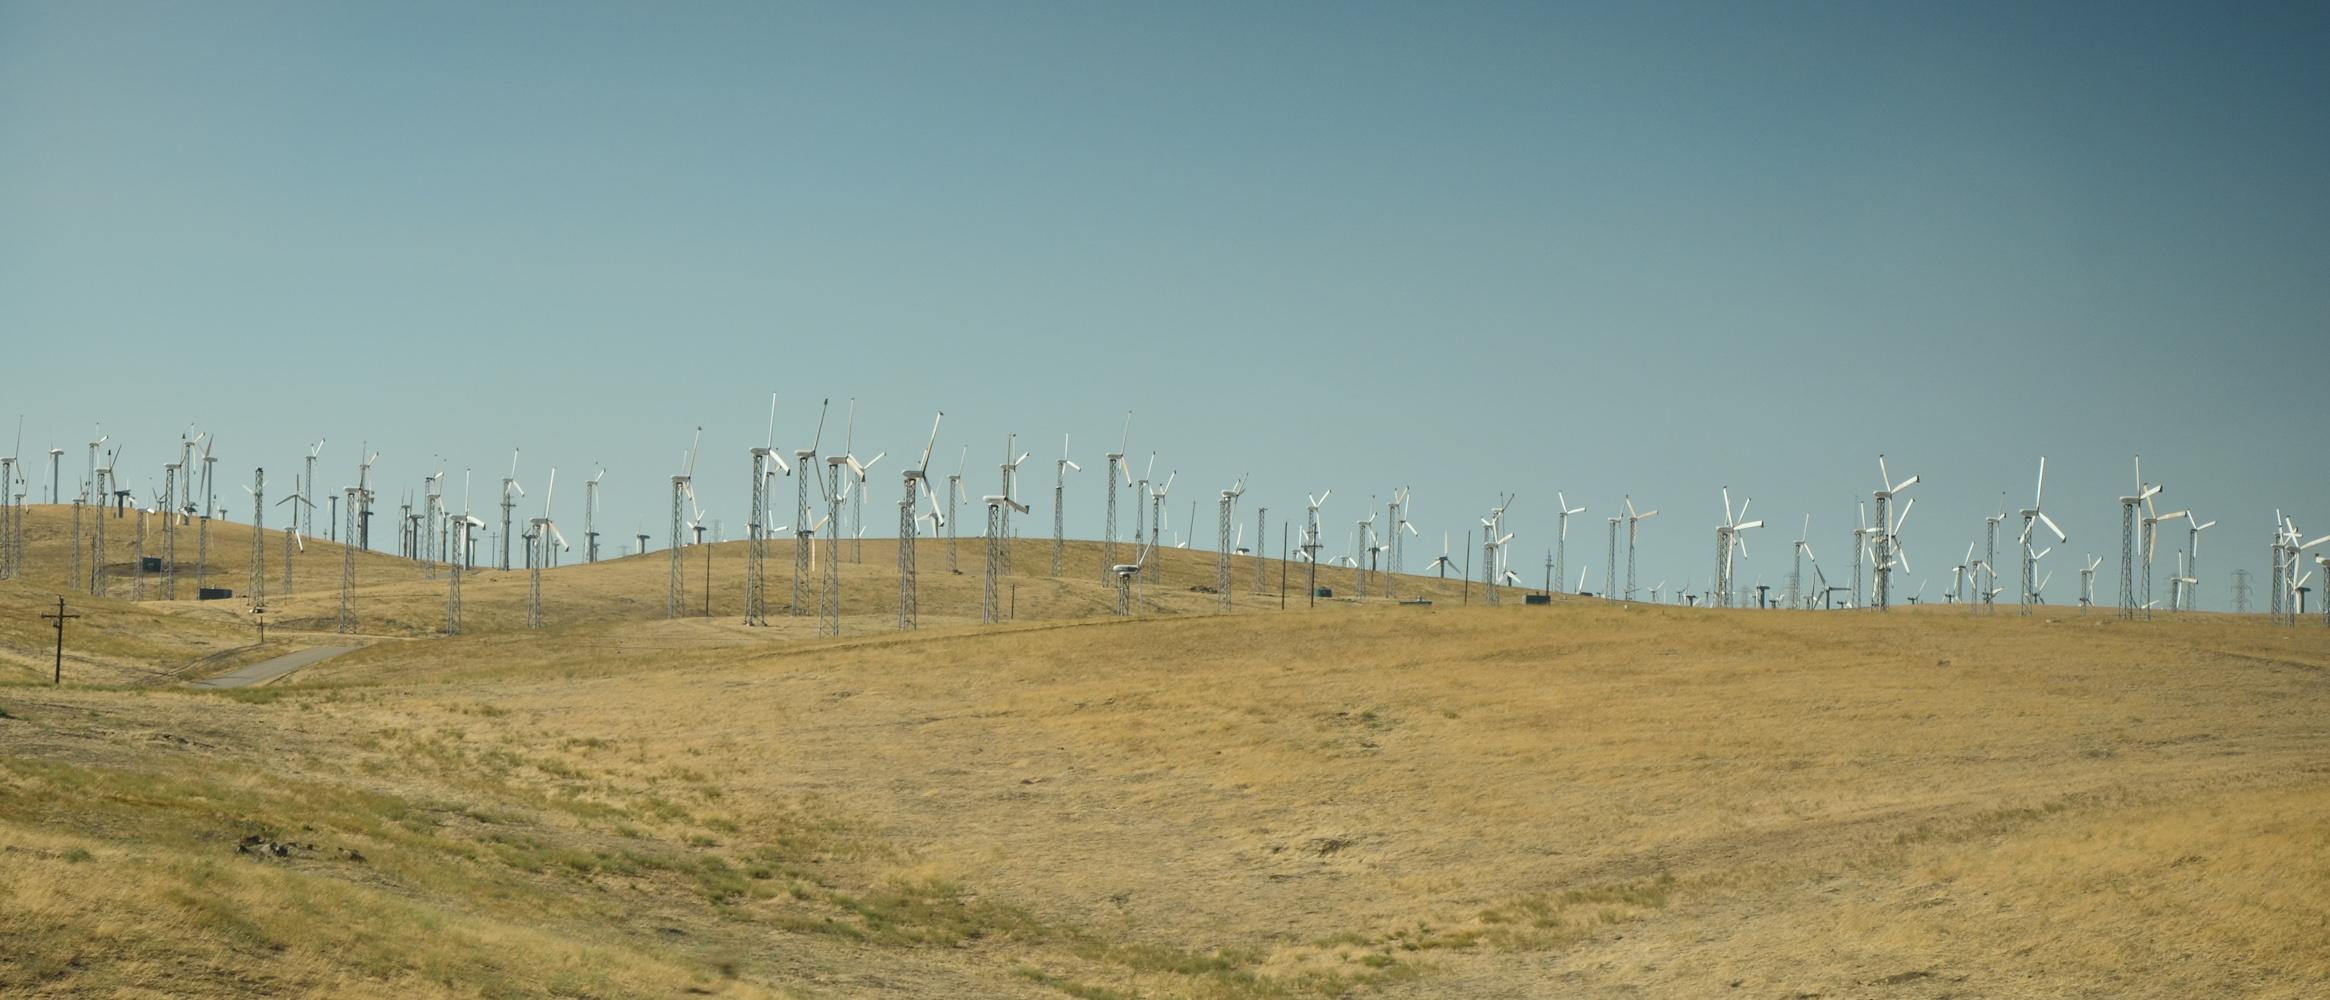 Wind Turbines on drought land